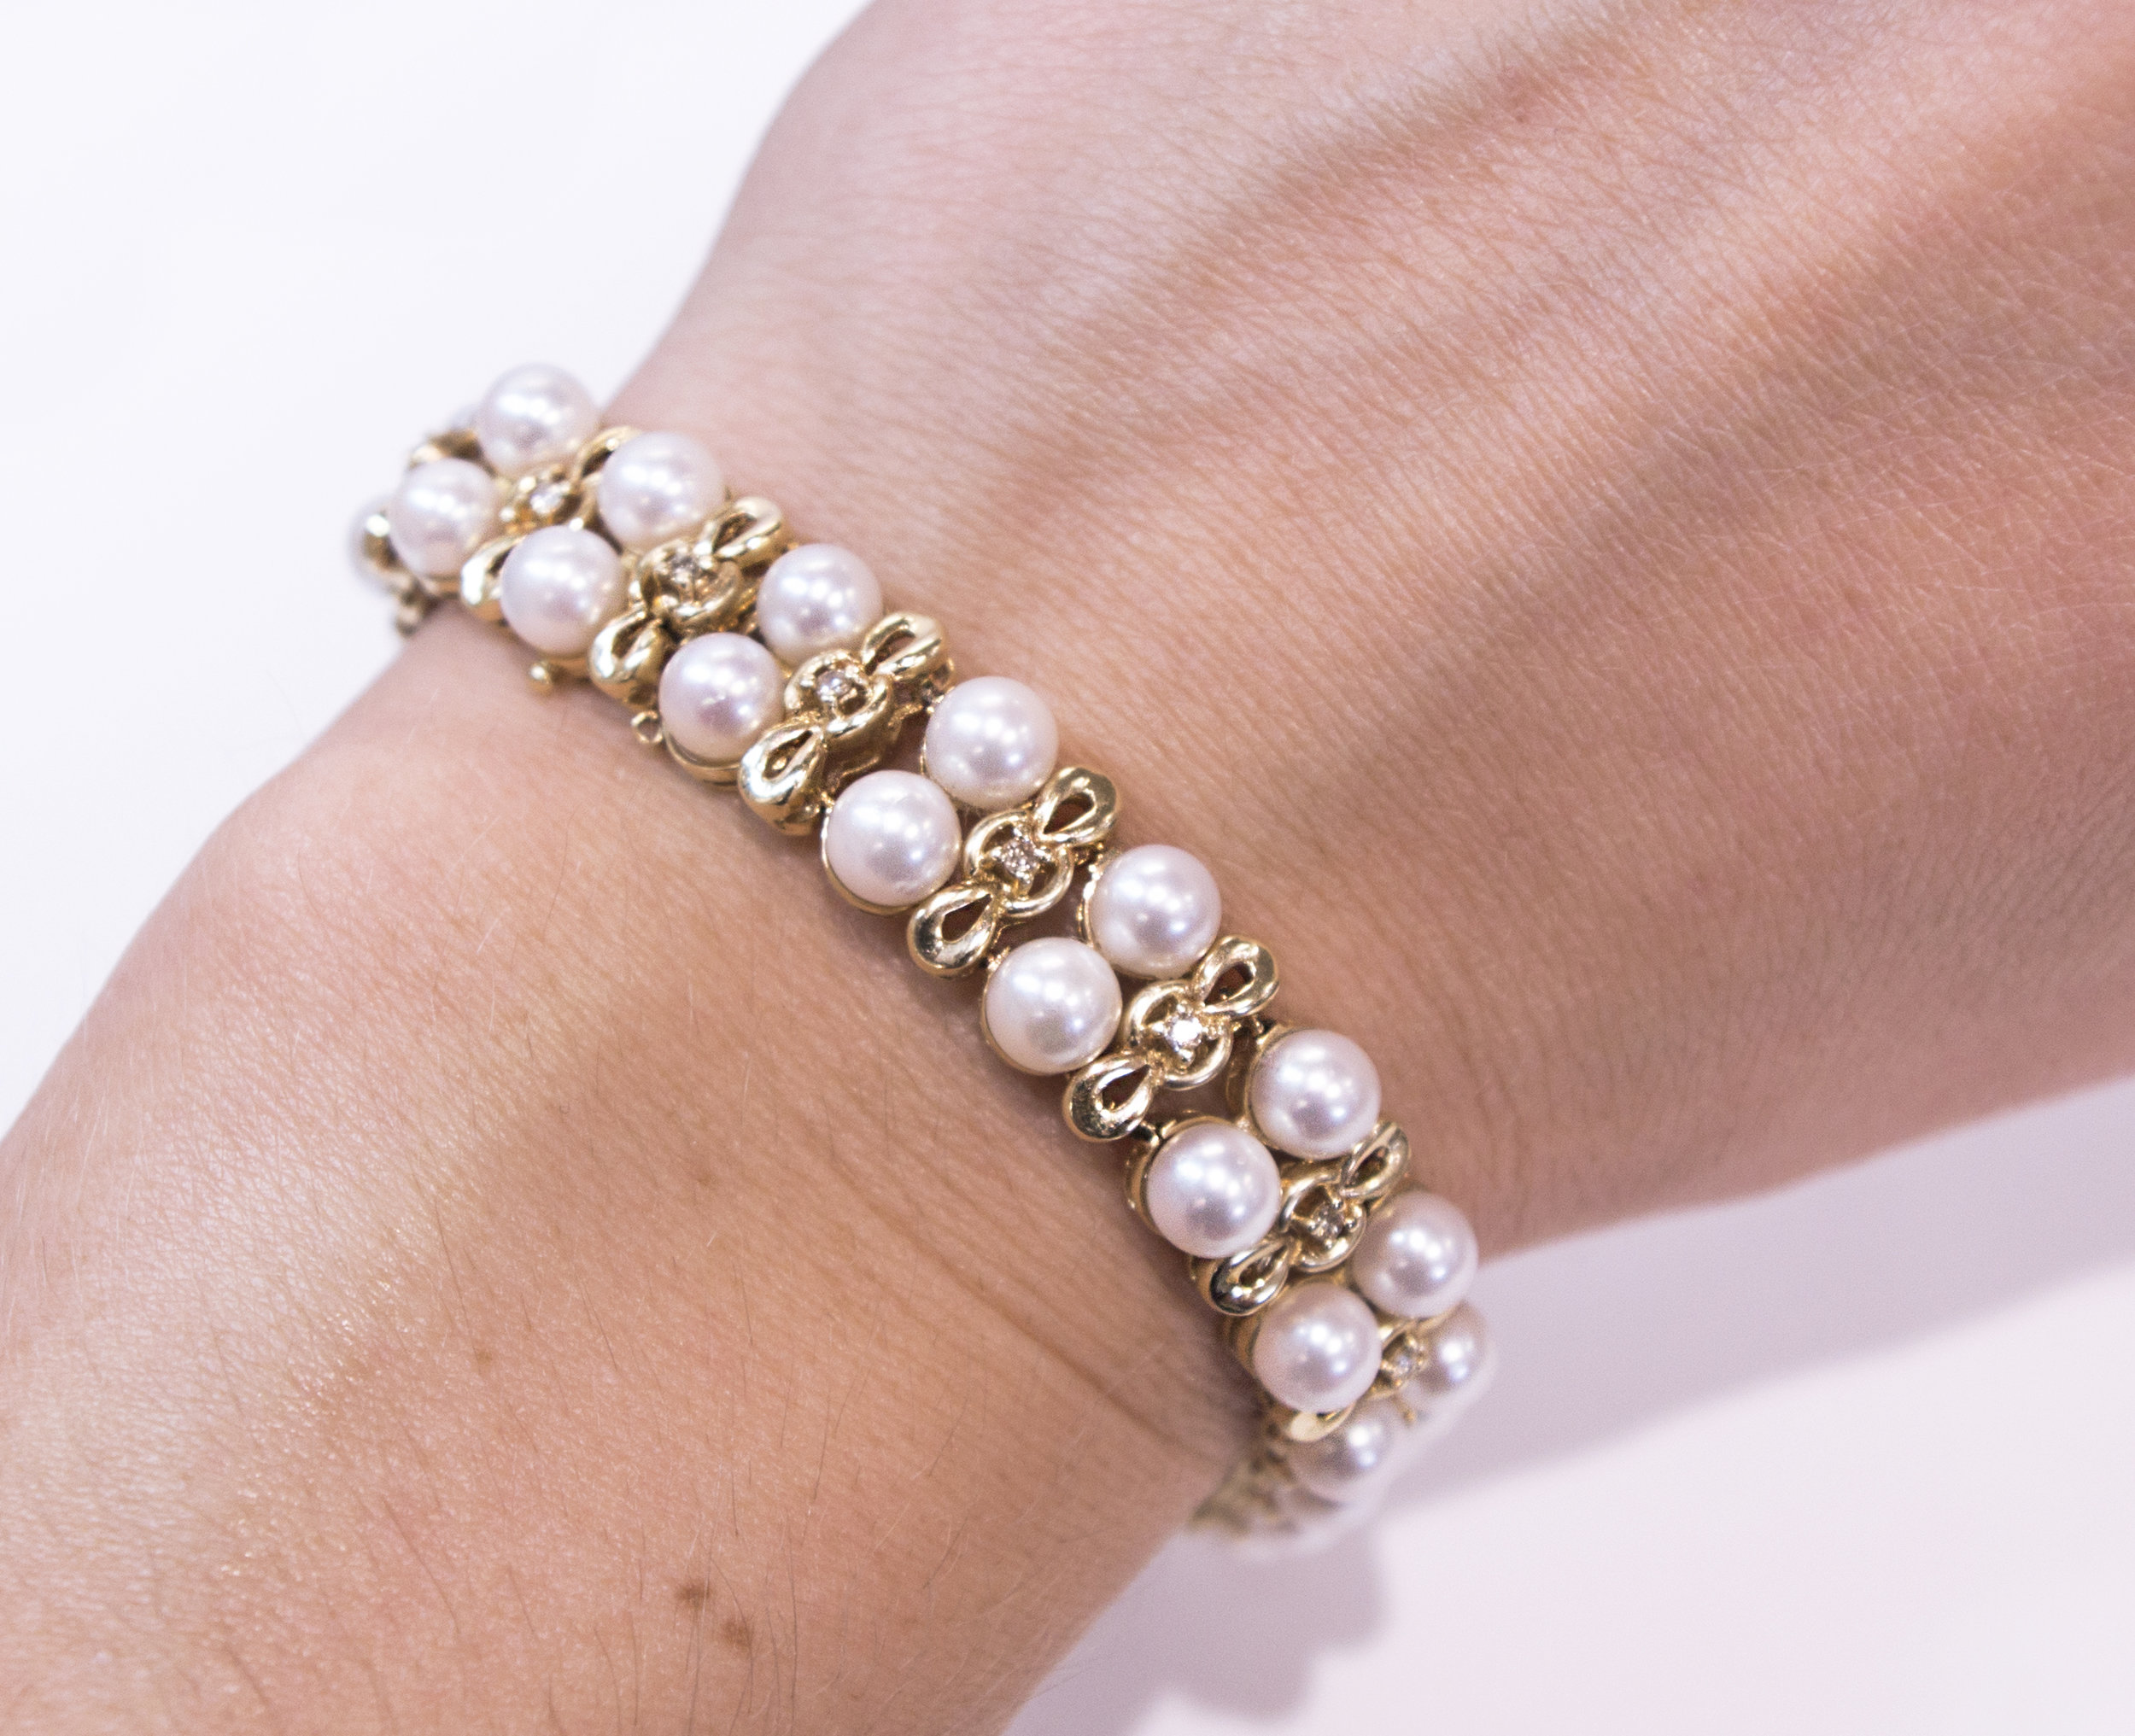 Pearl and diamond bracelet set in 14KY Gold.JPG